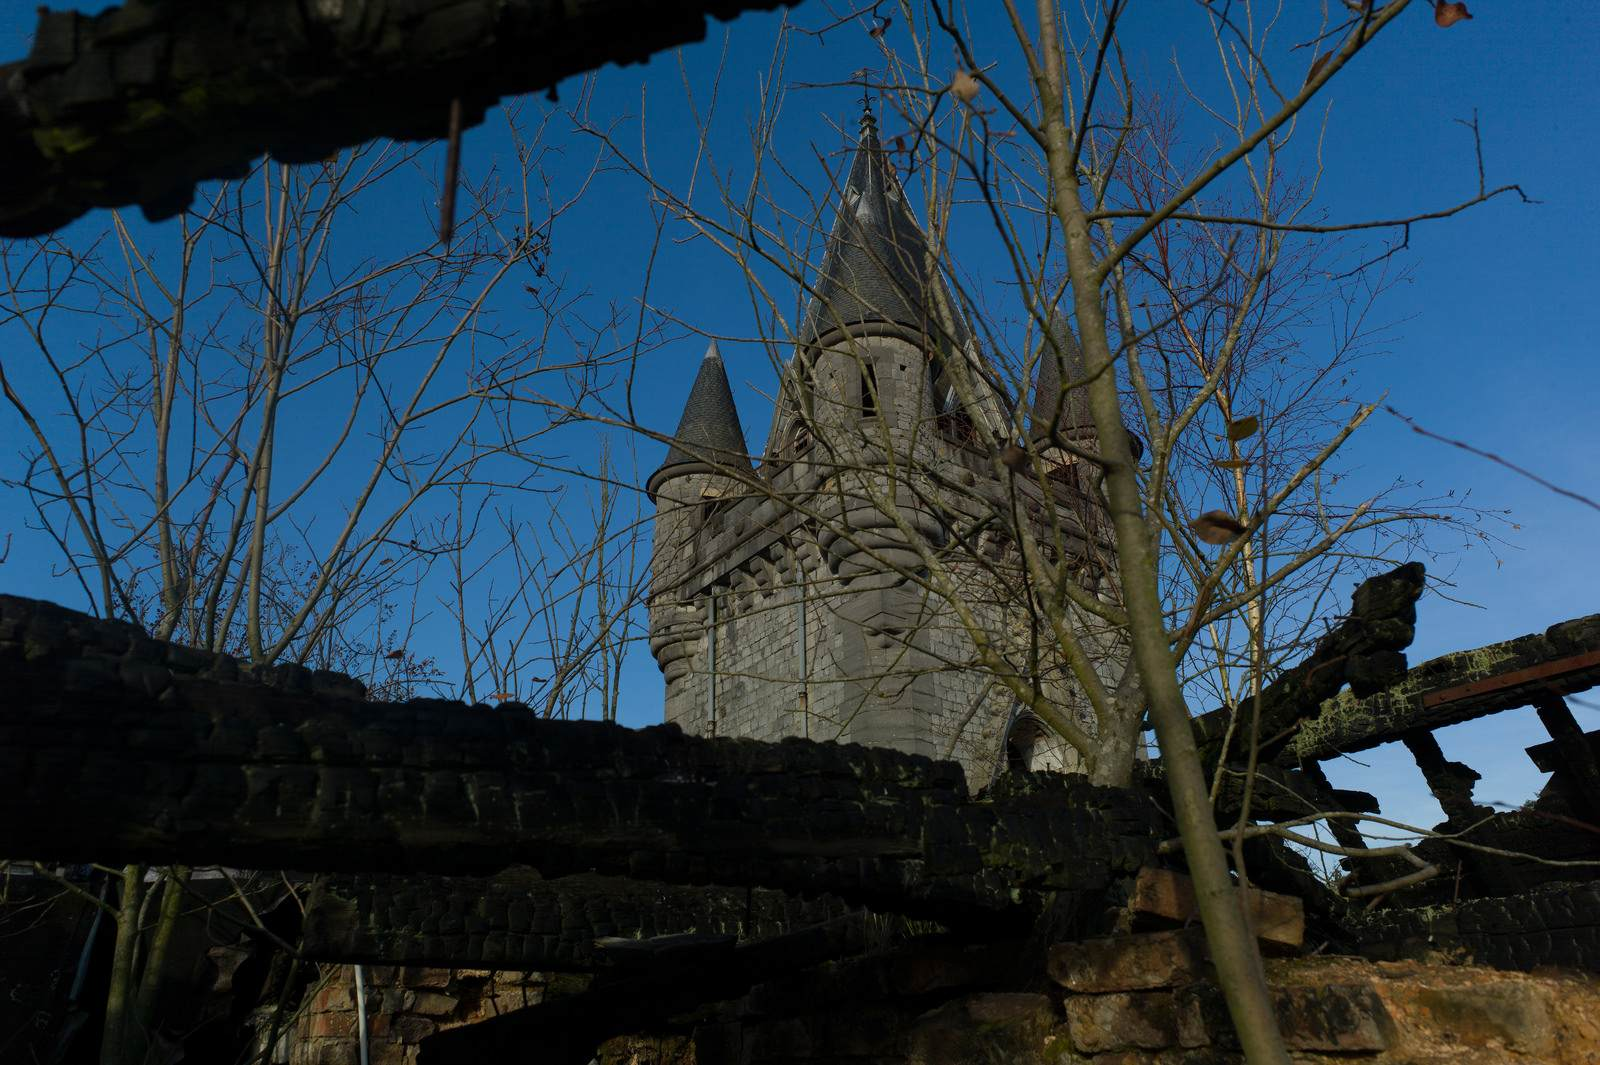 castle miranda2 The Abandoned Castle Miranda, Belgium